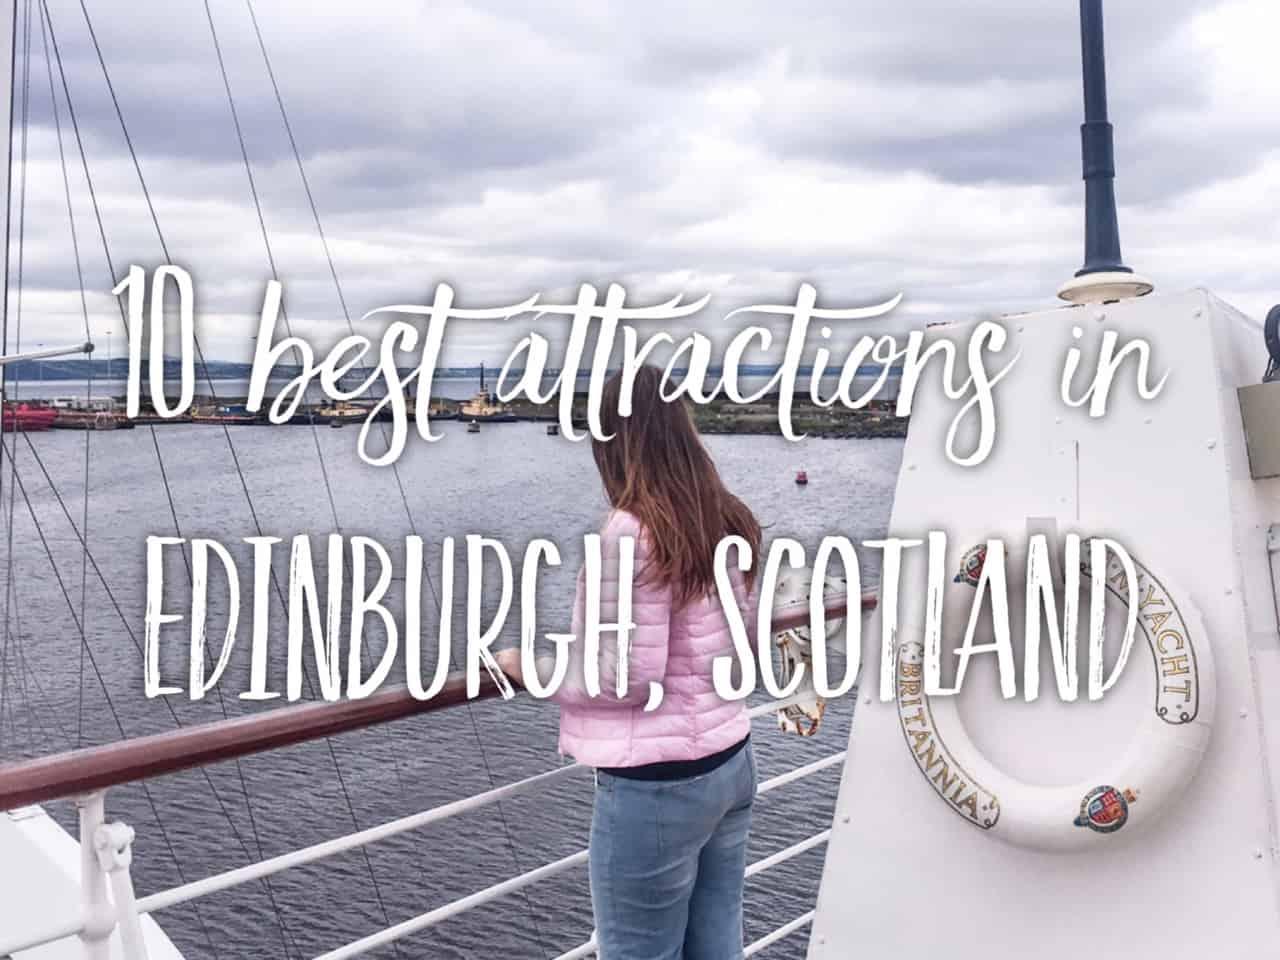 10 absolutely best attractions in Edinburgh, Scotland